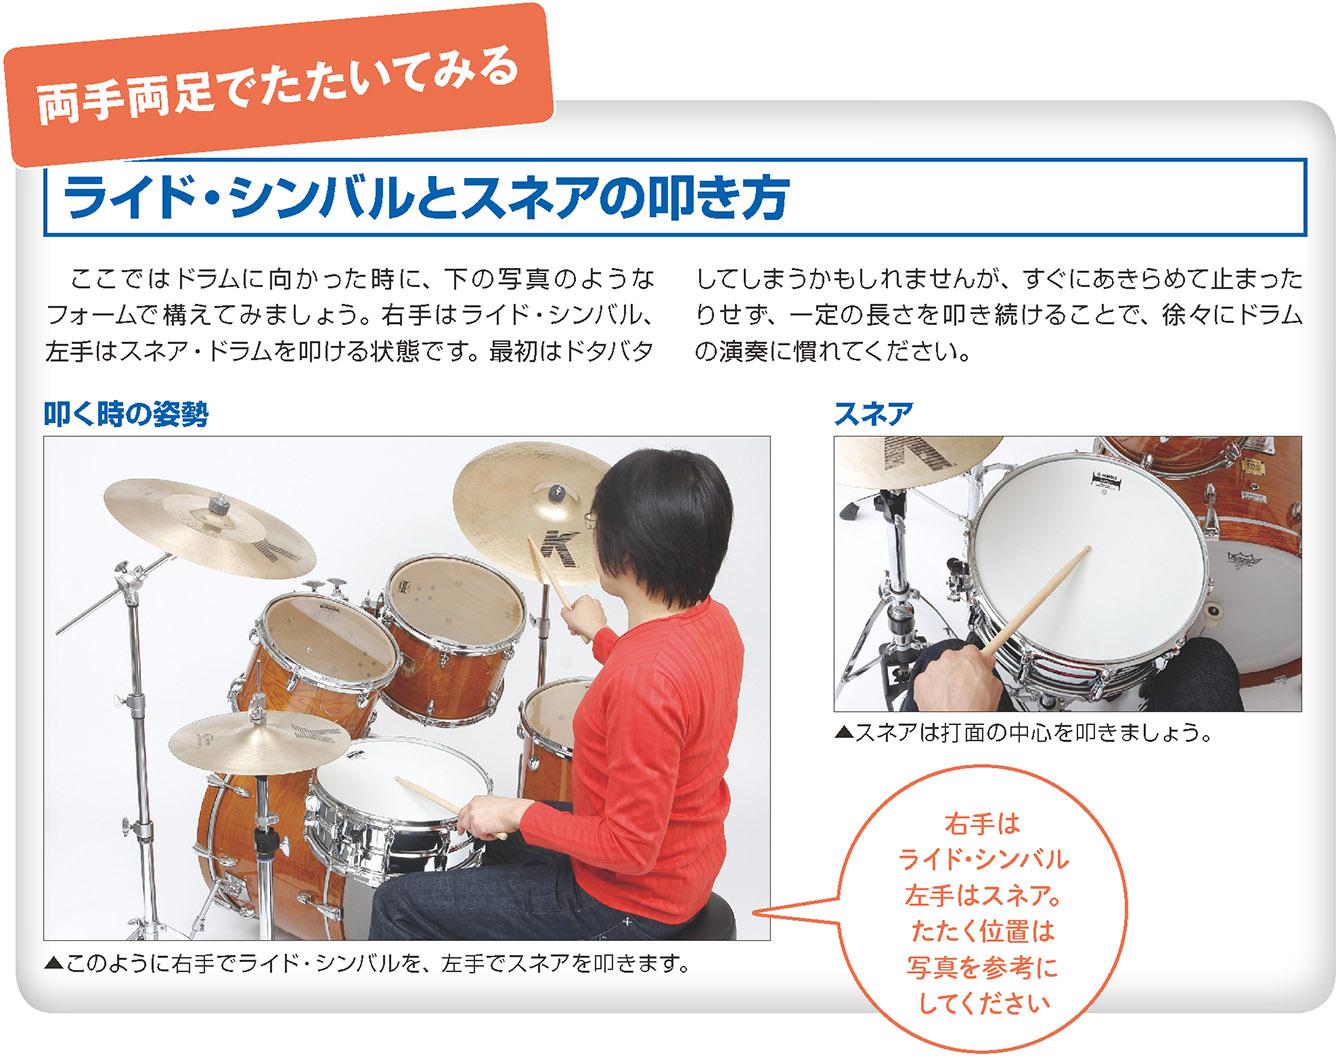 http://musicschool-navi.jp/columns/keion_v1_dr07.jpg